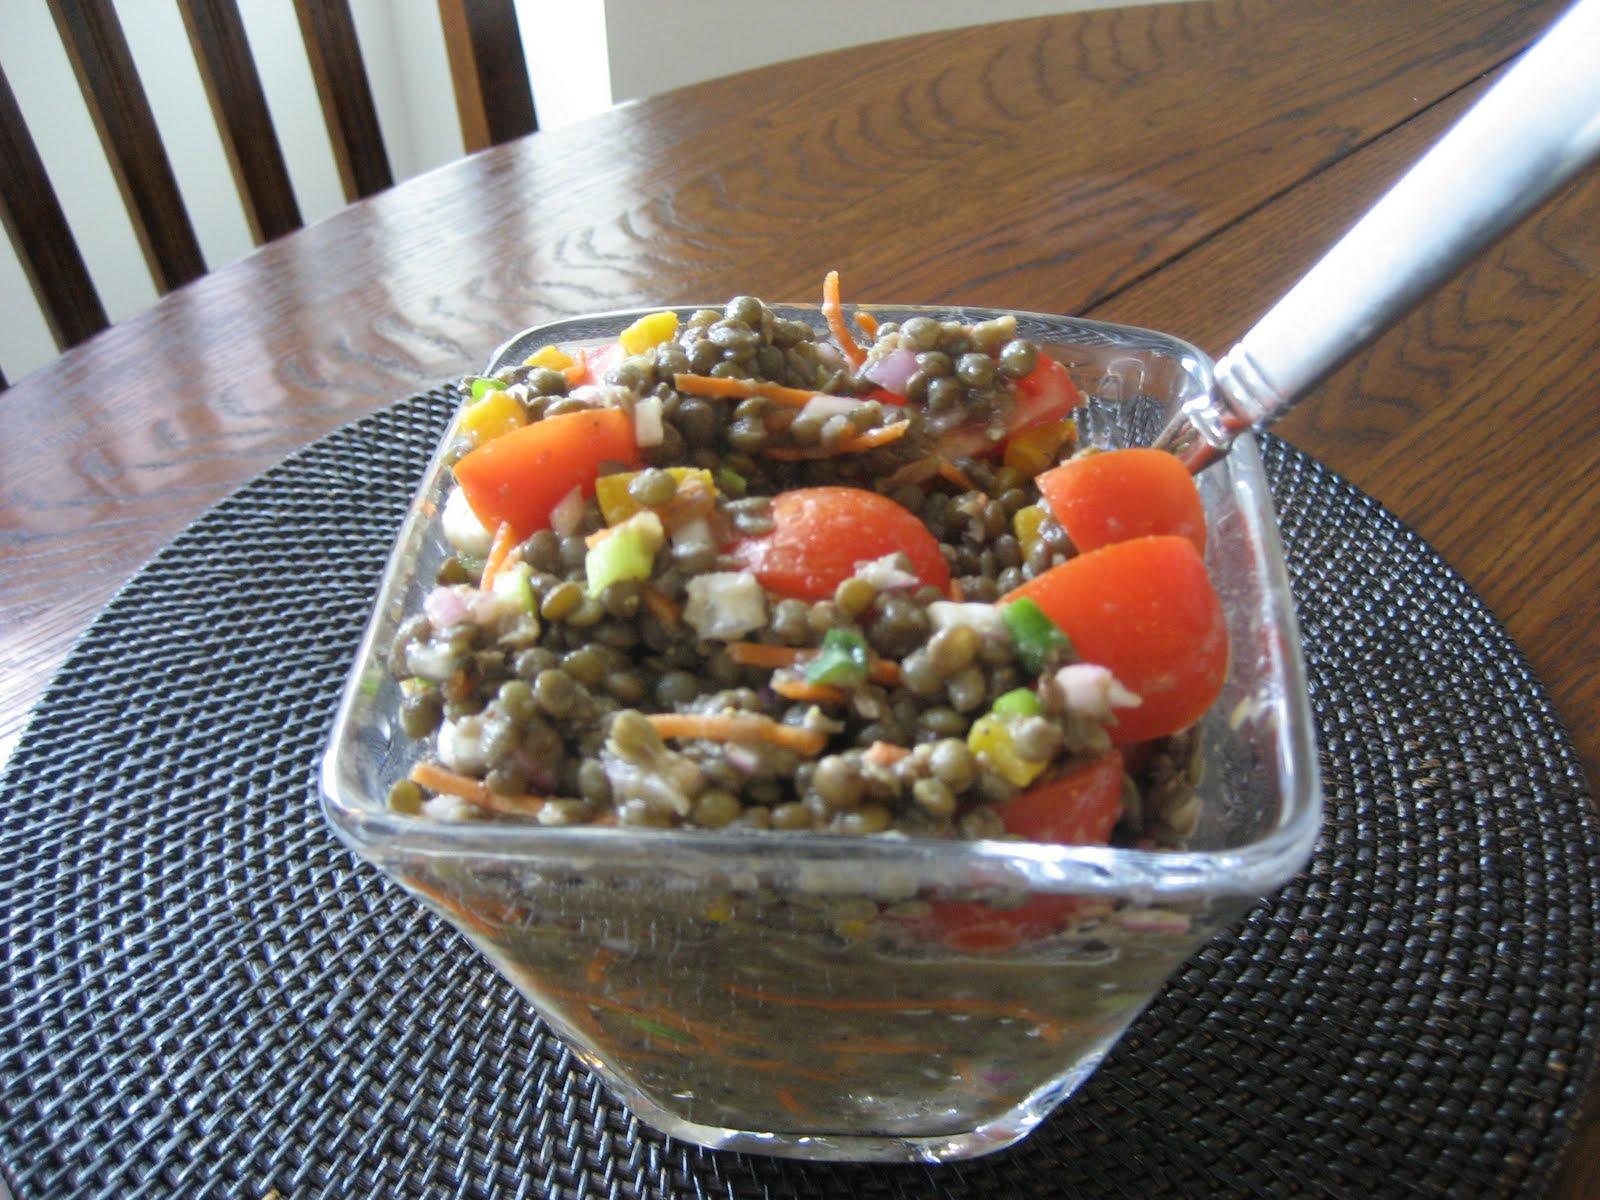 Smoked Lentil Salad With Sriracha Miso Mayonnaise Recipes — Dishmaps